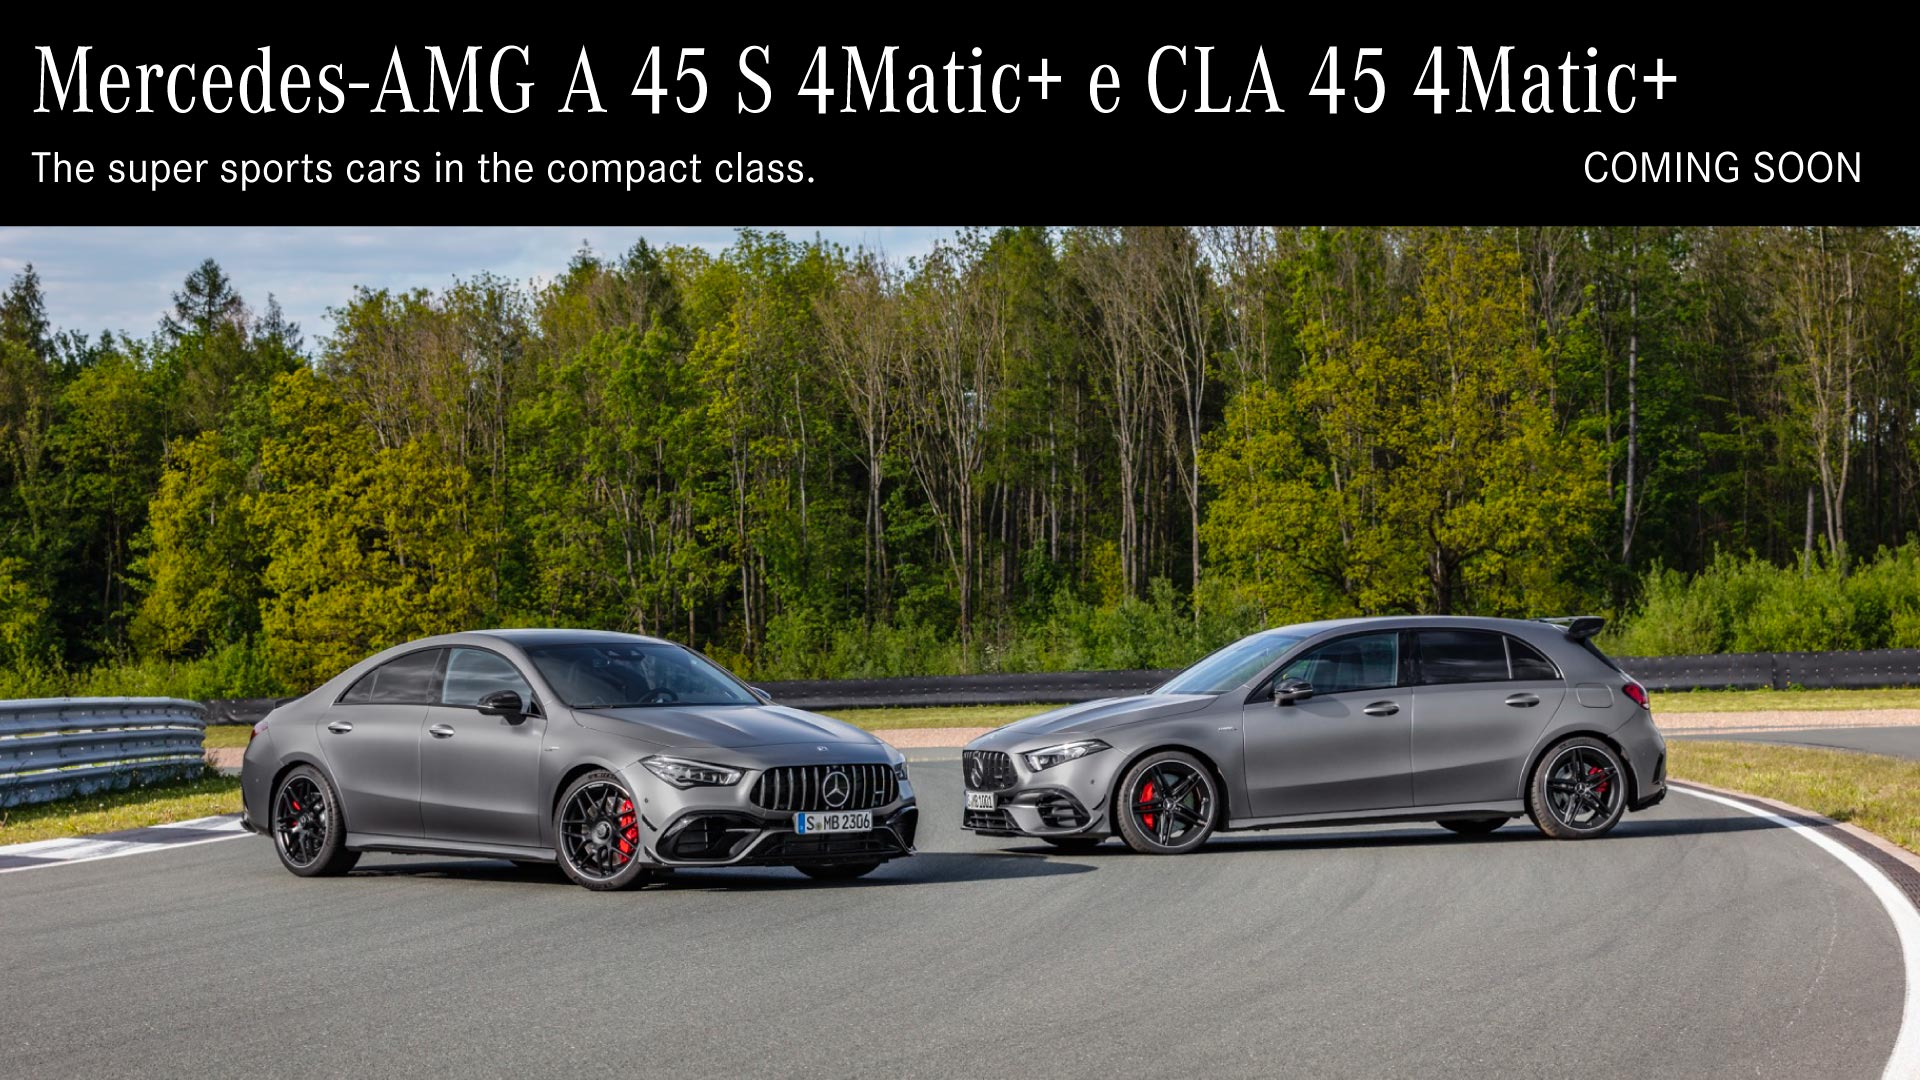 Mercedes-AMG A 45 S e CLA 45